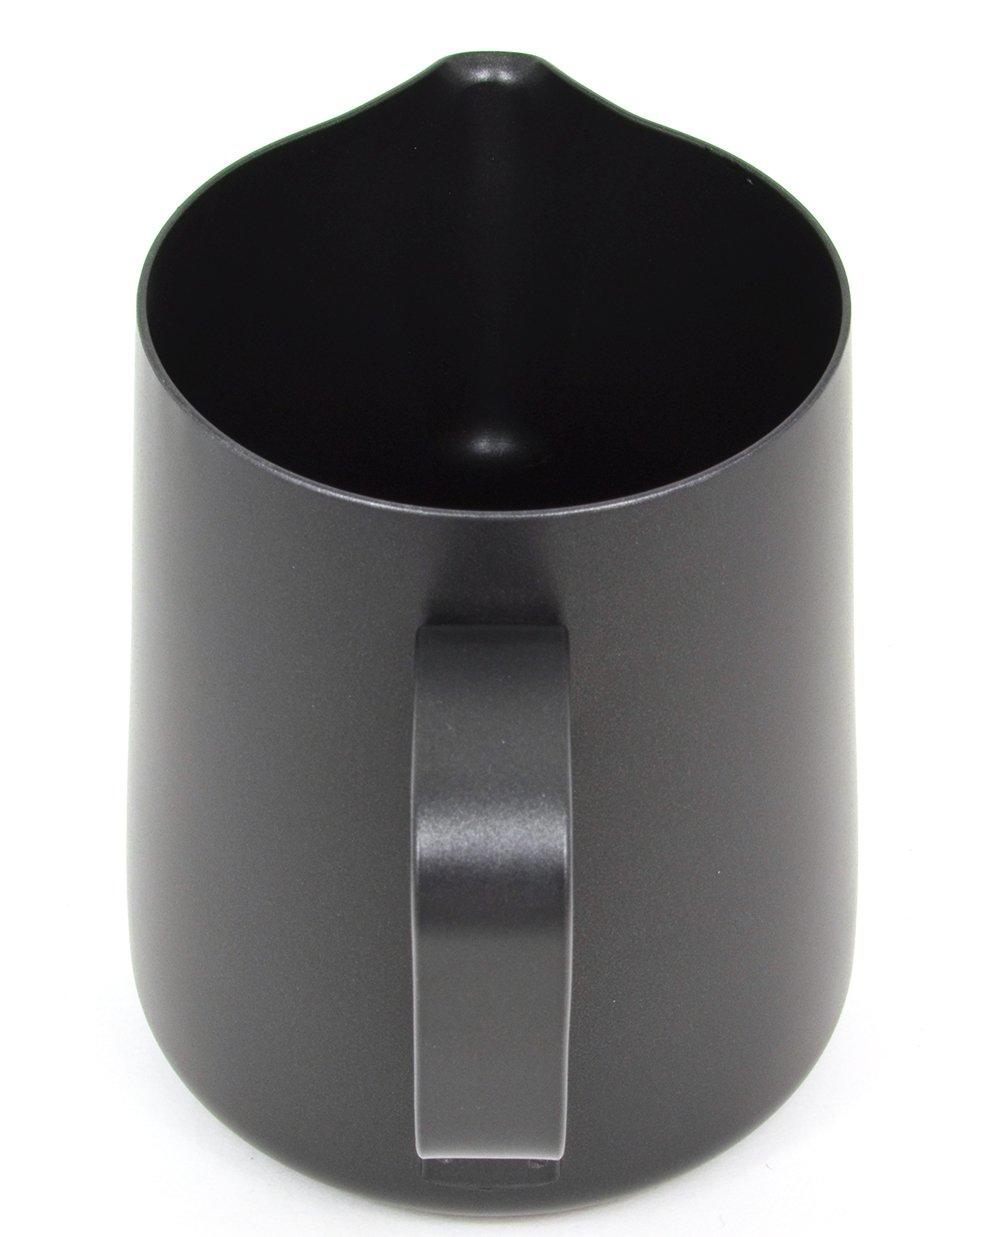 Stainless Steel 12 oz Blue RHBLUE12OZ BrewGlobal Rhinoware Stealth Milk Pitcher